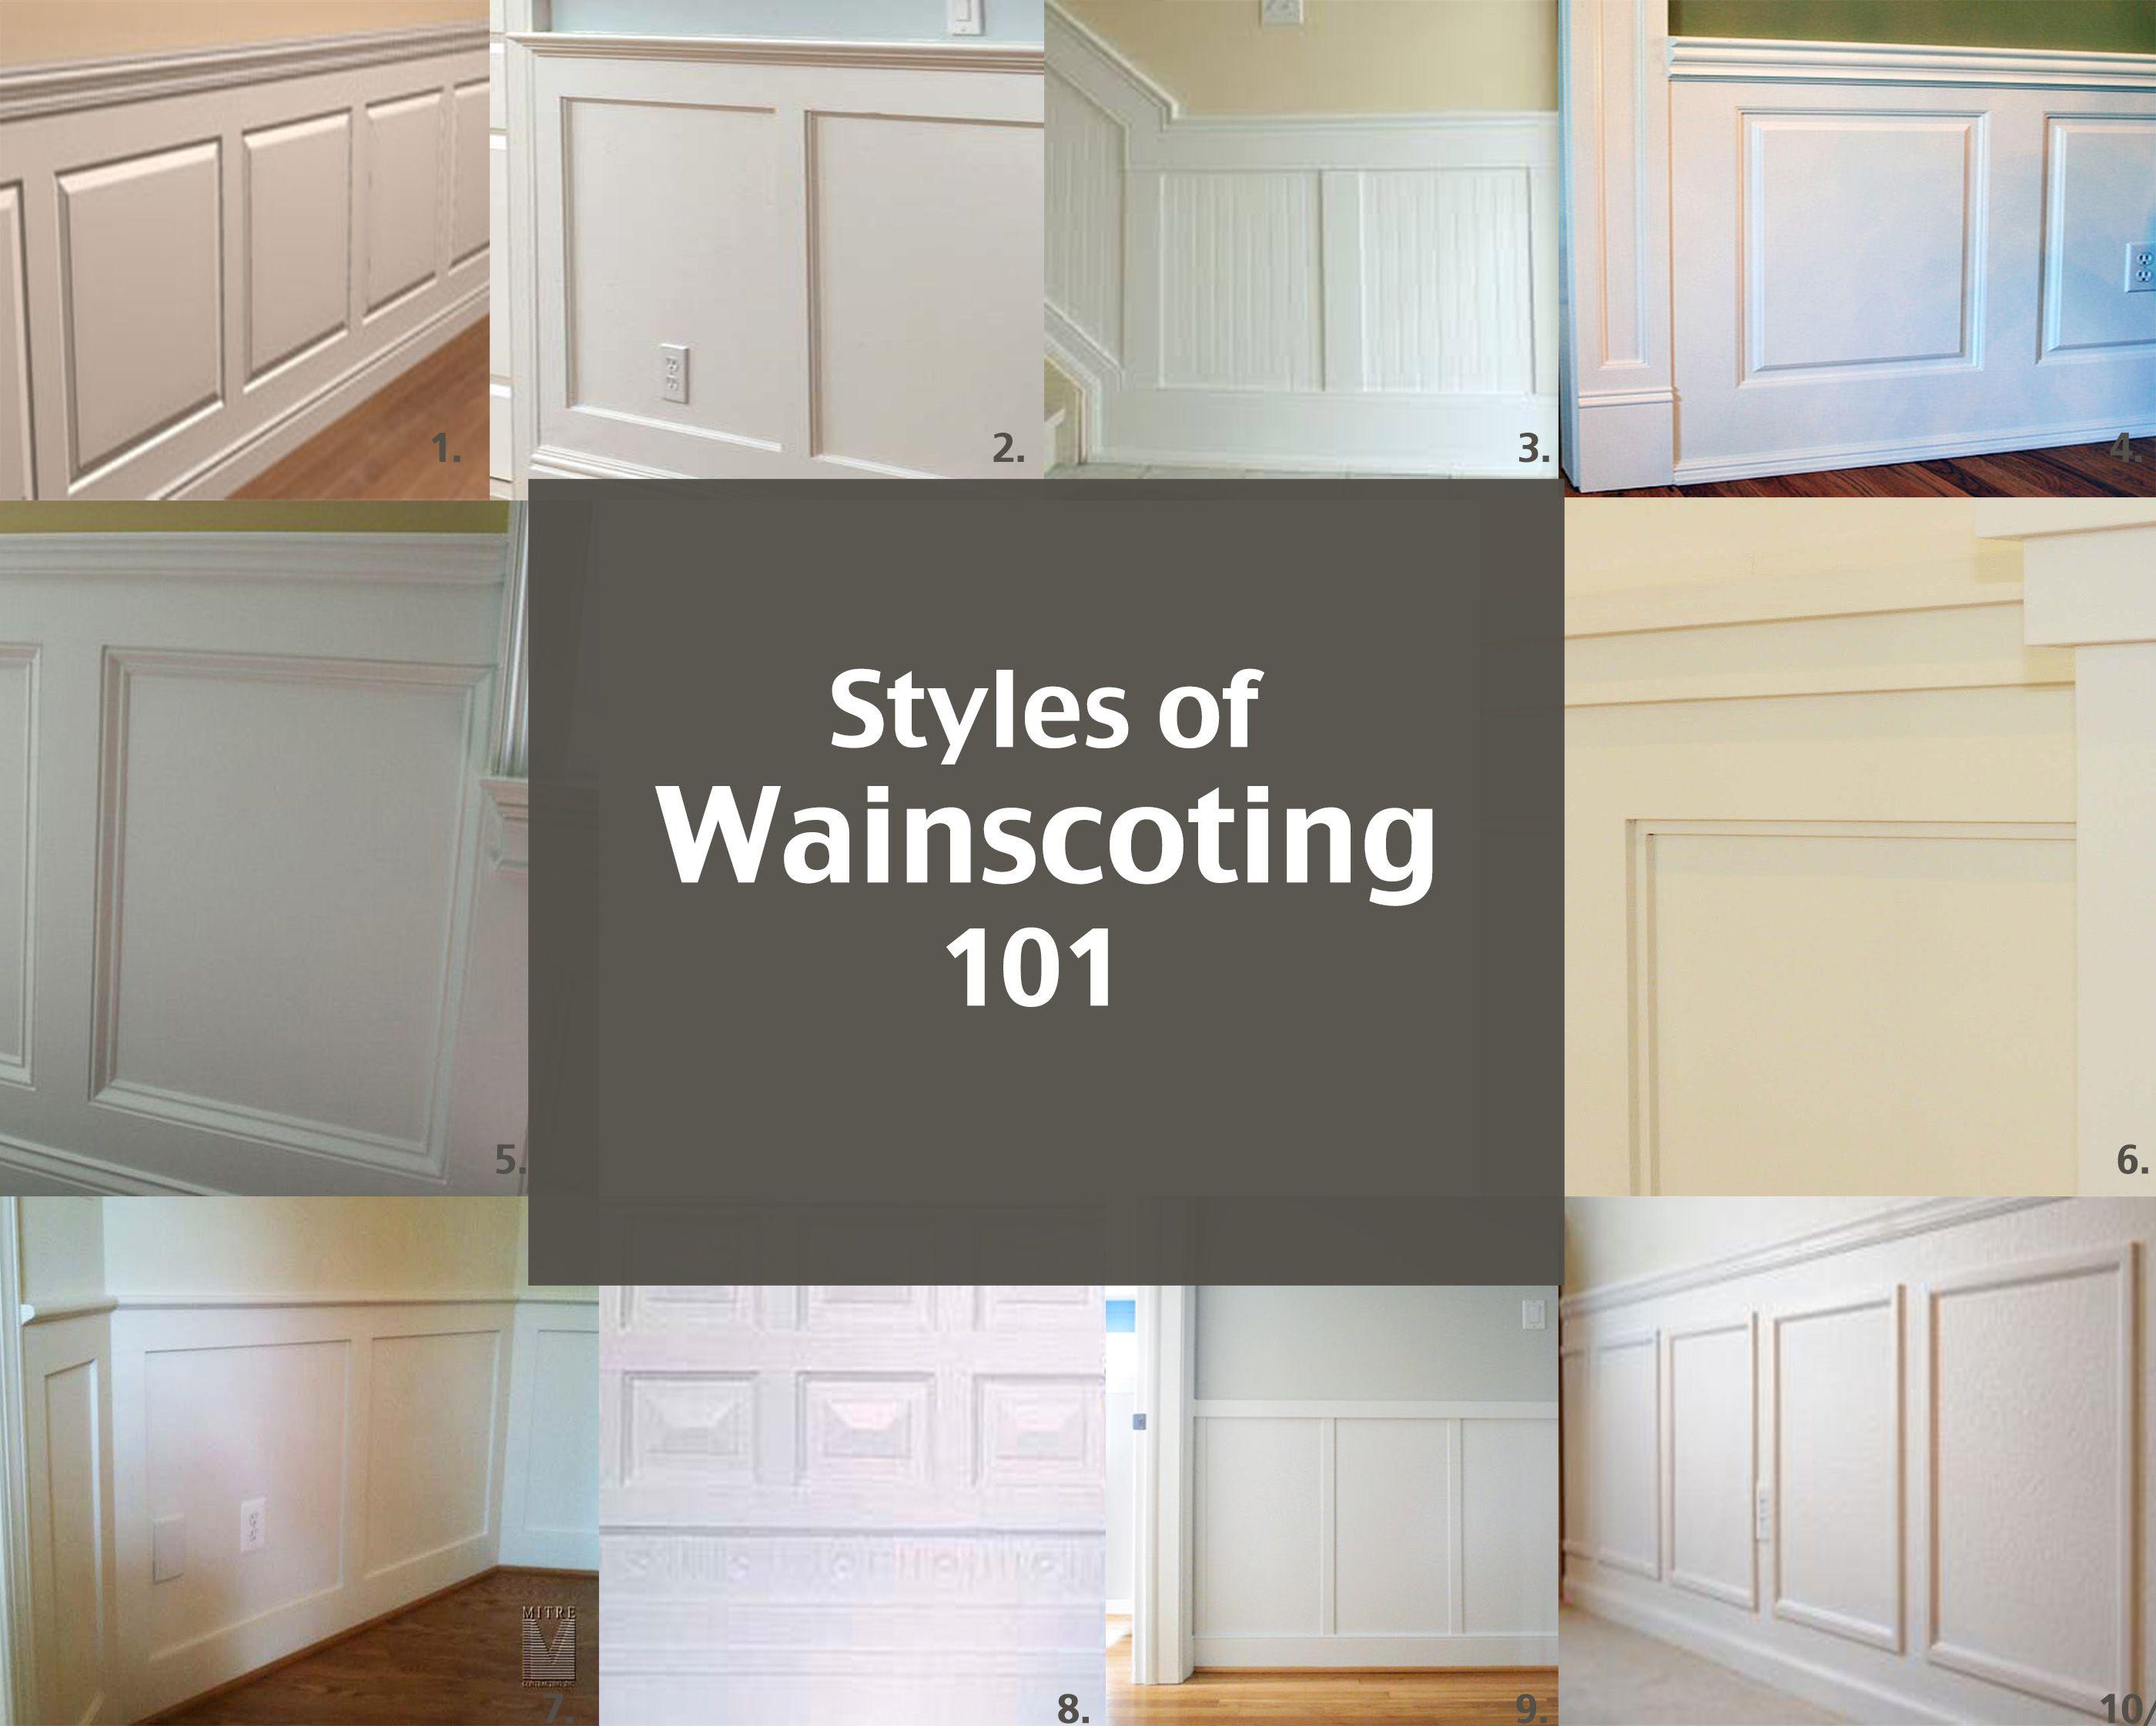 Styles Of Wainscoting Elizabeth Bixler Designs Dining Room Wainscoting Wainscoting Styles Wainscoting